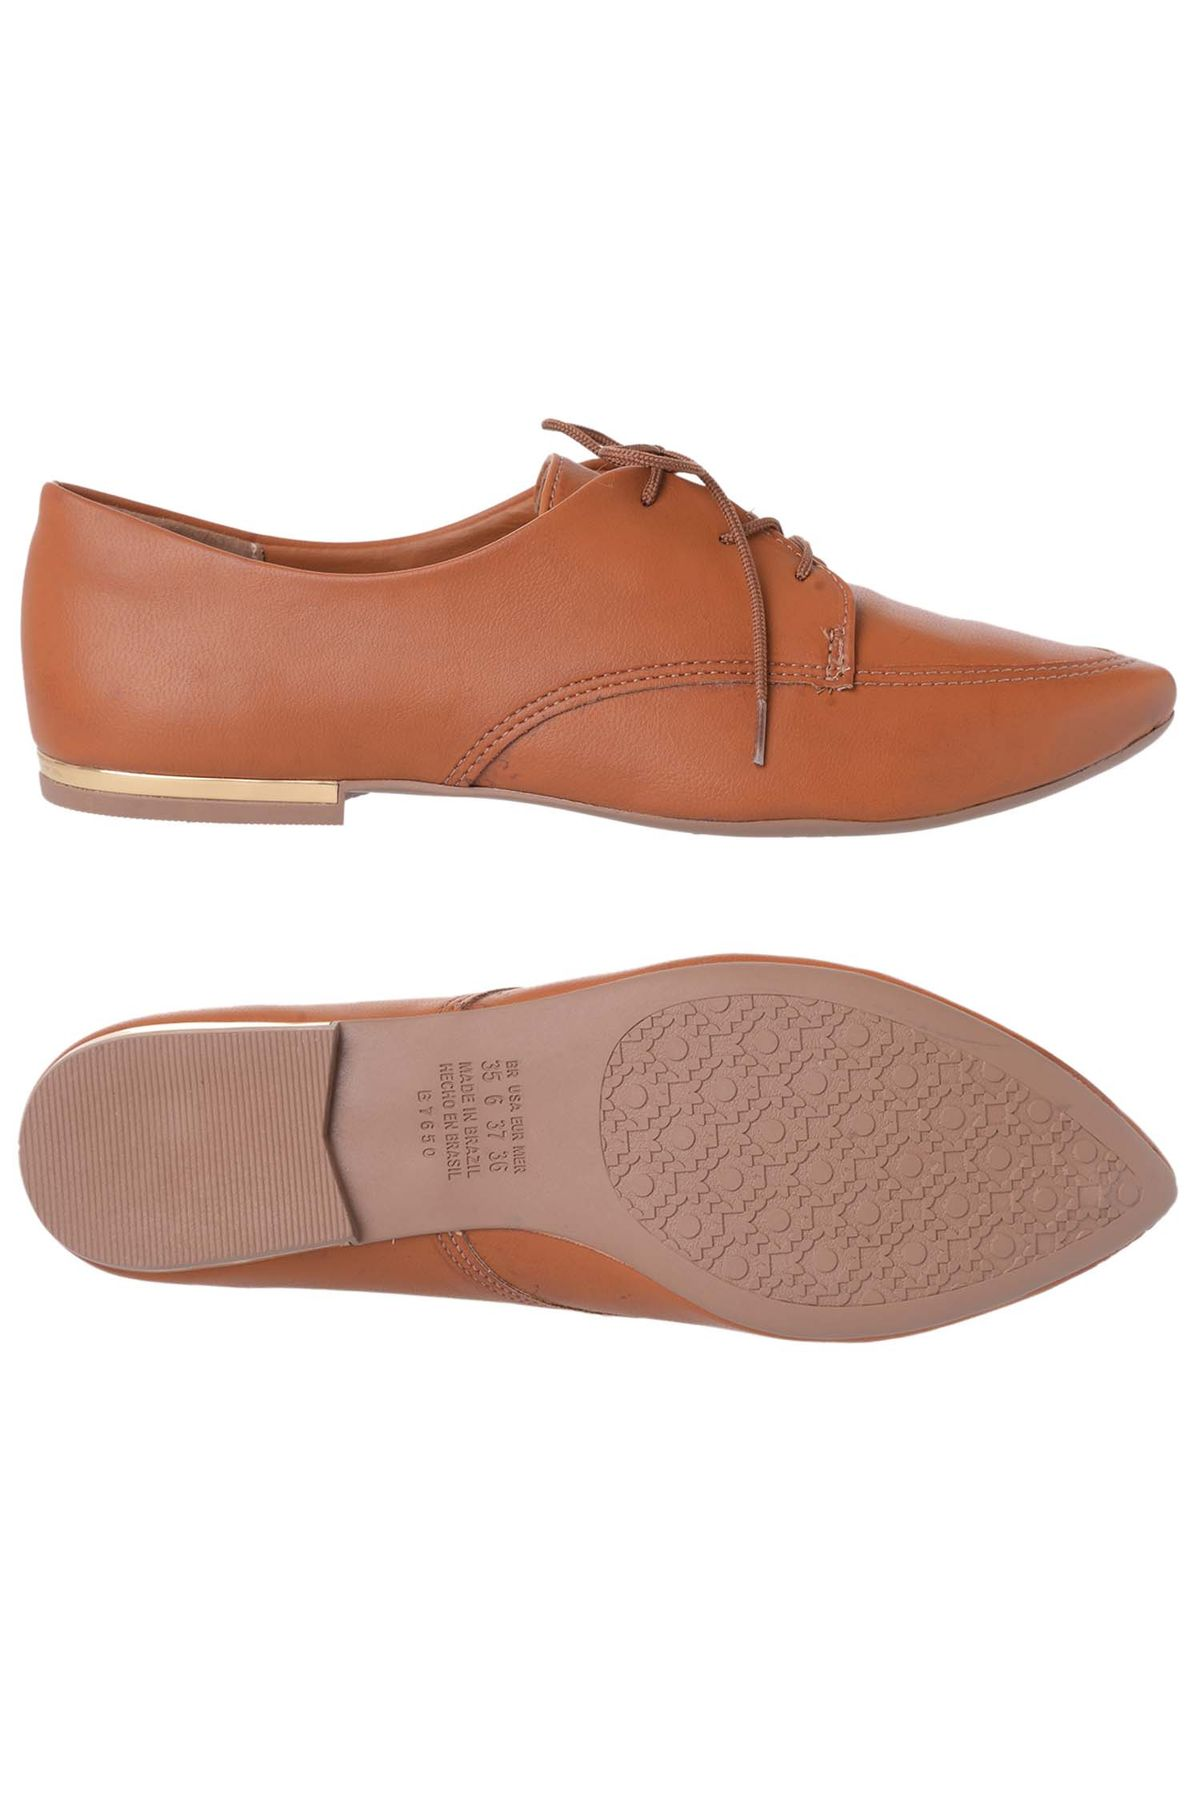 30dd1f7b1 Oxford Dakota Juliete   Mundial Calçados - Mundial Calçados